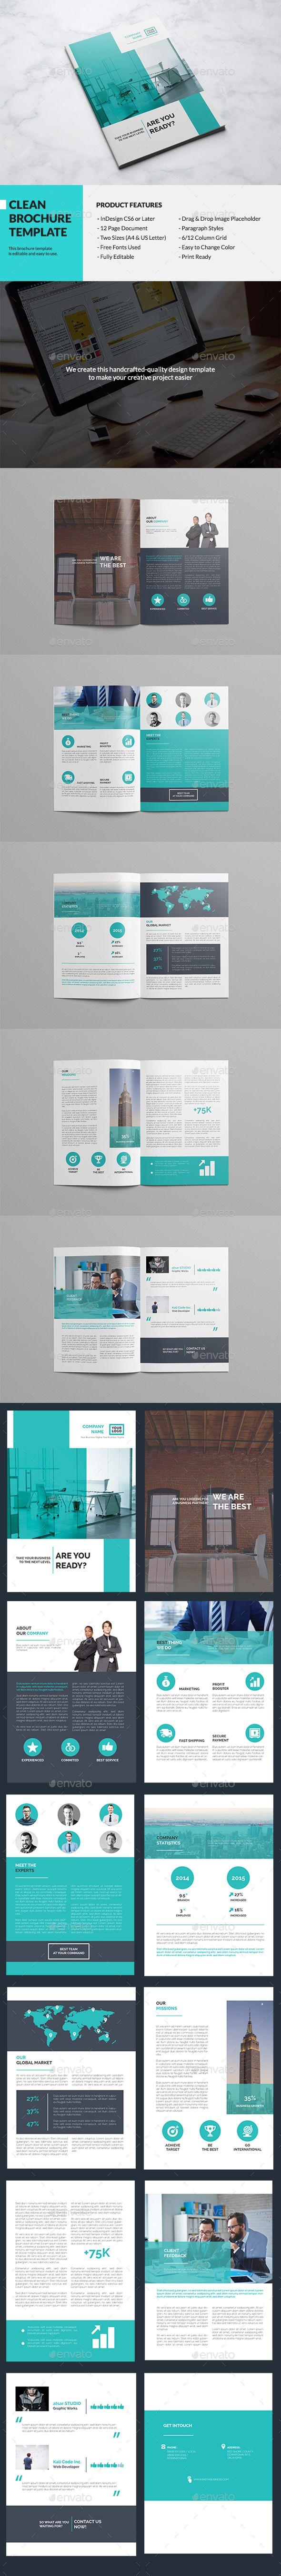 Clean Multipurpose Brochure Template InDesign INDD #design Download: http://graphicriver.net/item/clean-multipurpose-brochure/13500032?ref=ksioks